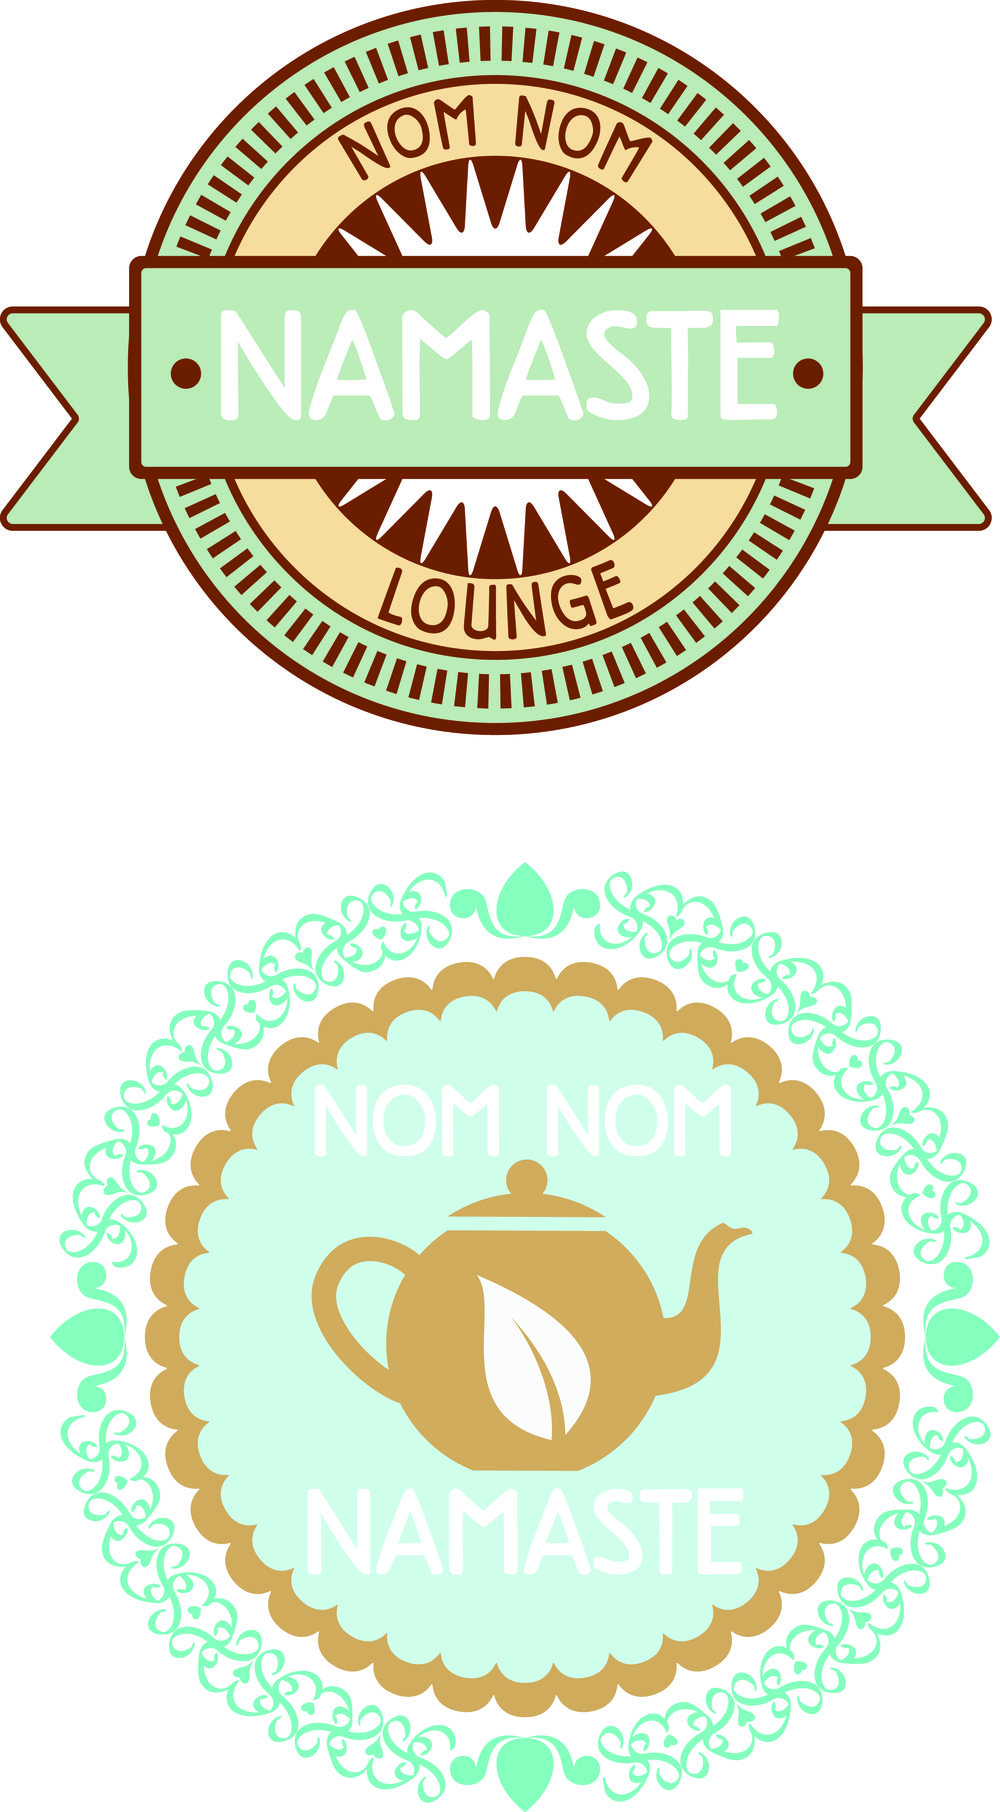 Logo Mockups - Nom Nom Namaste Cafe